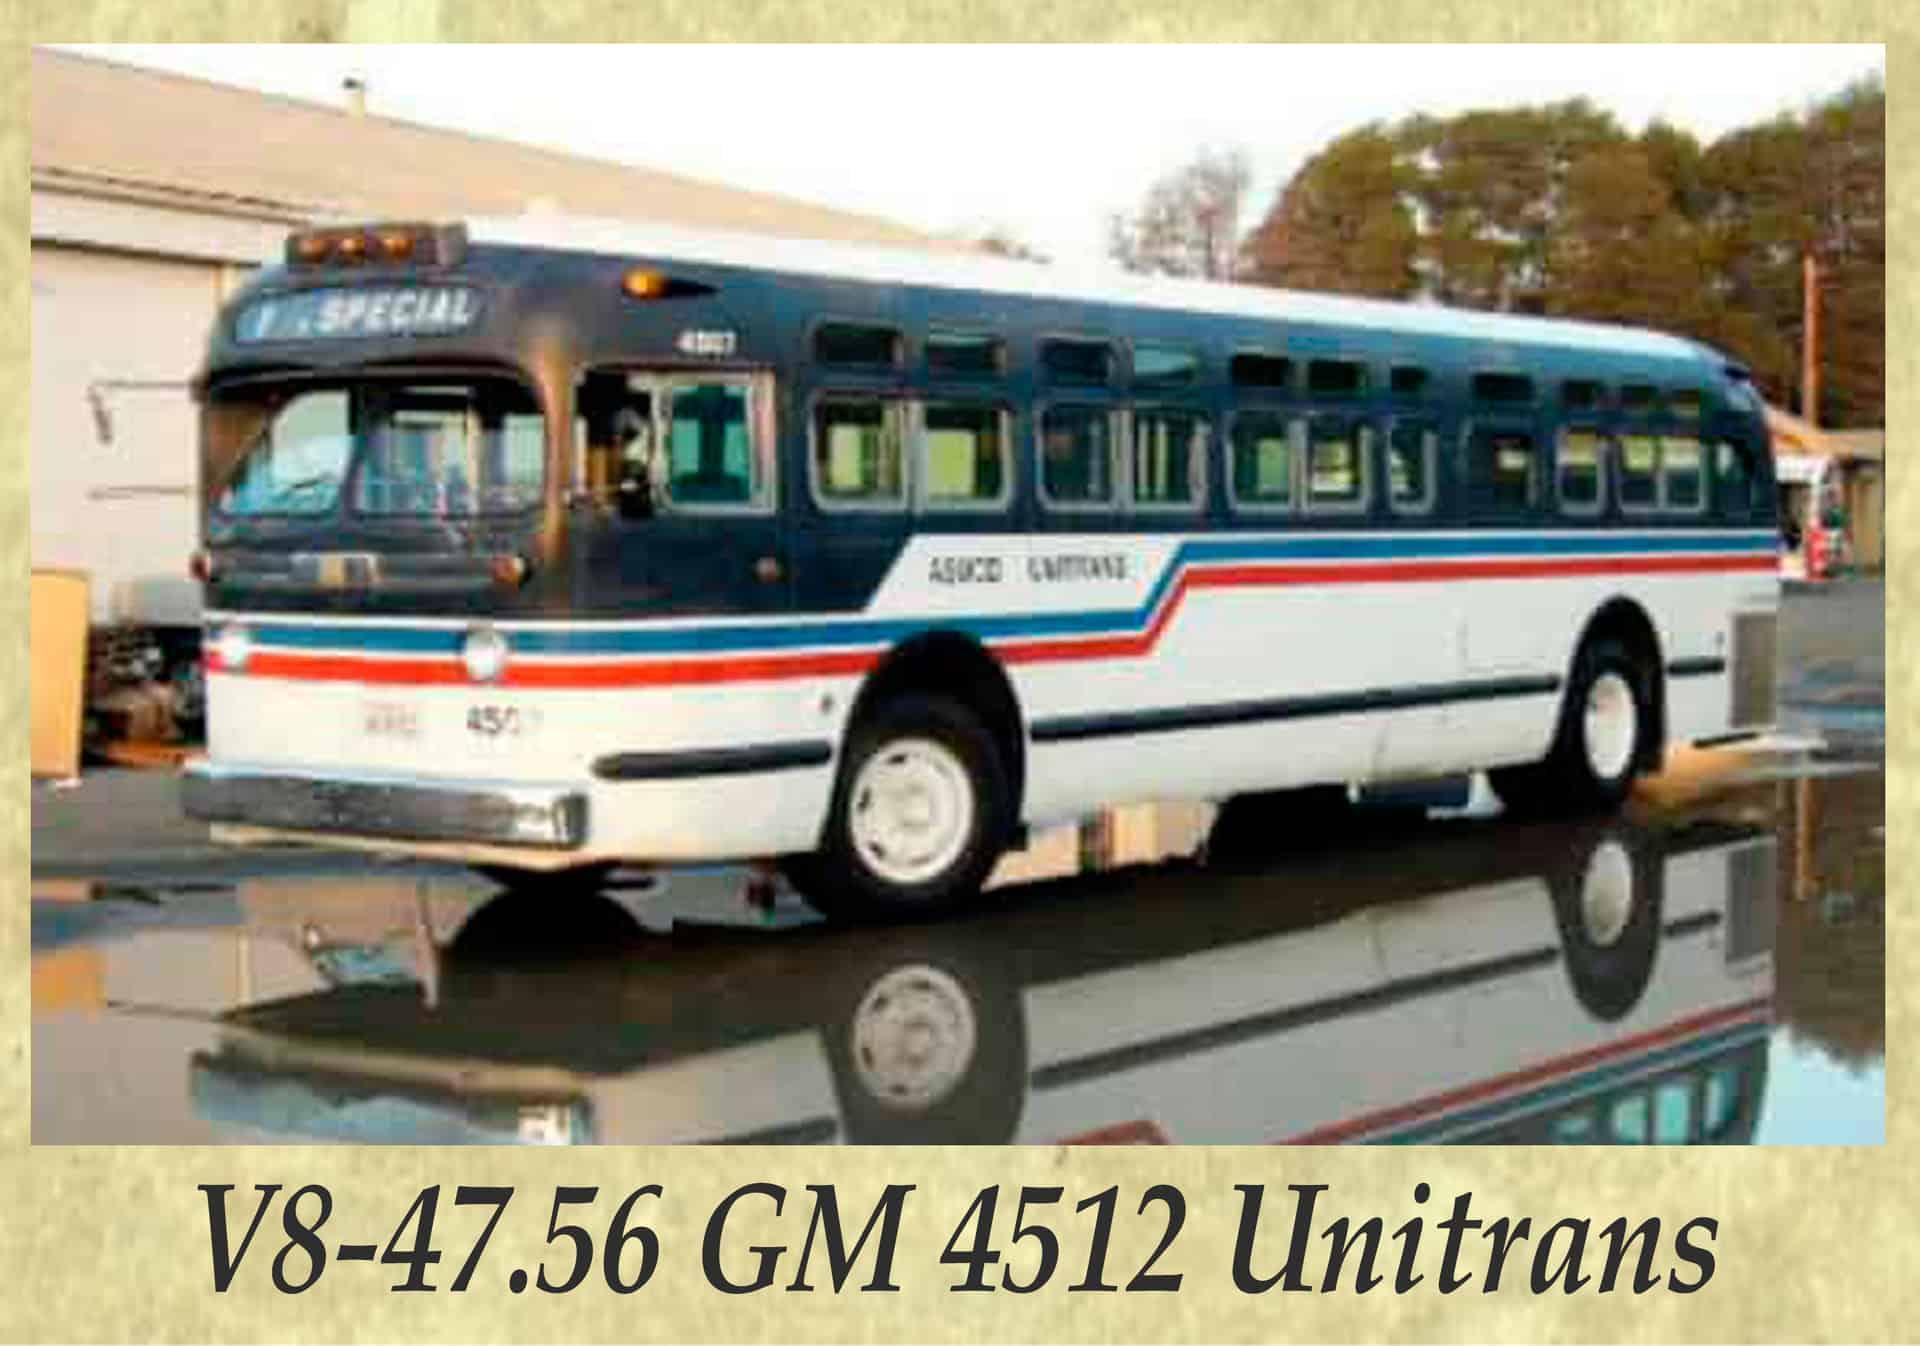 V8-47.56 GM 4512 Unitrans